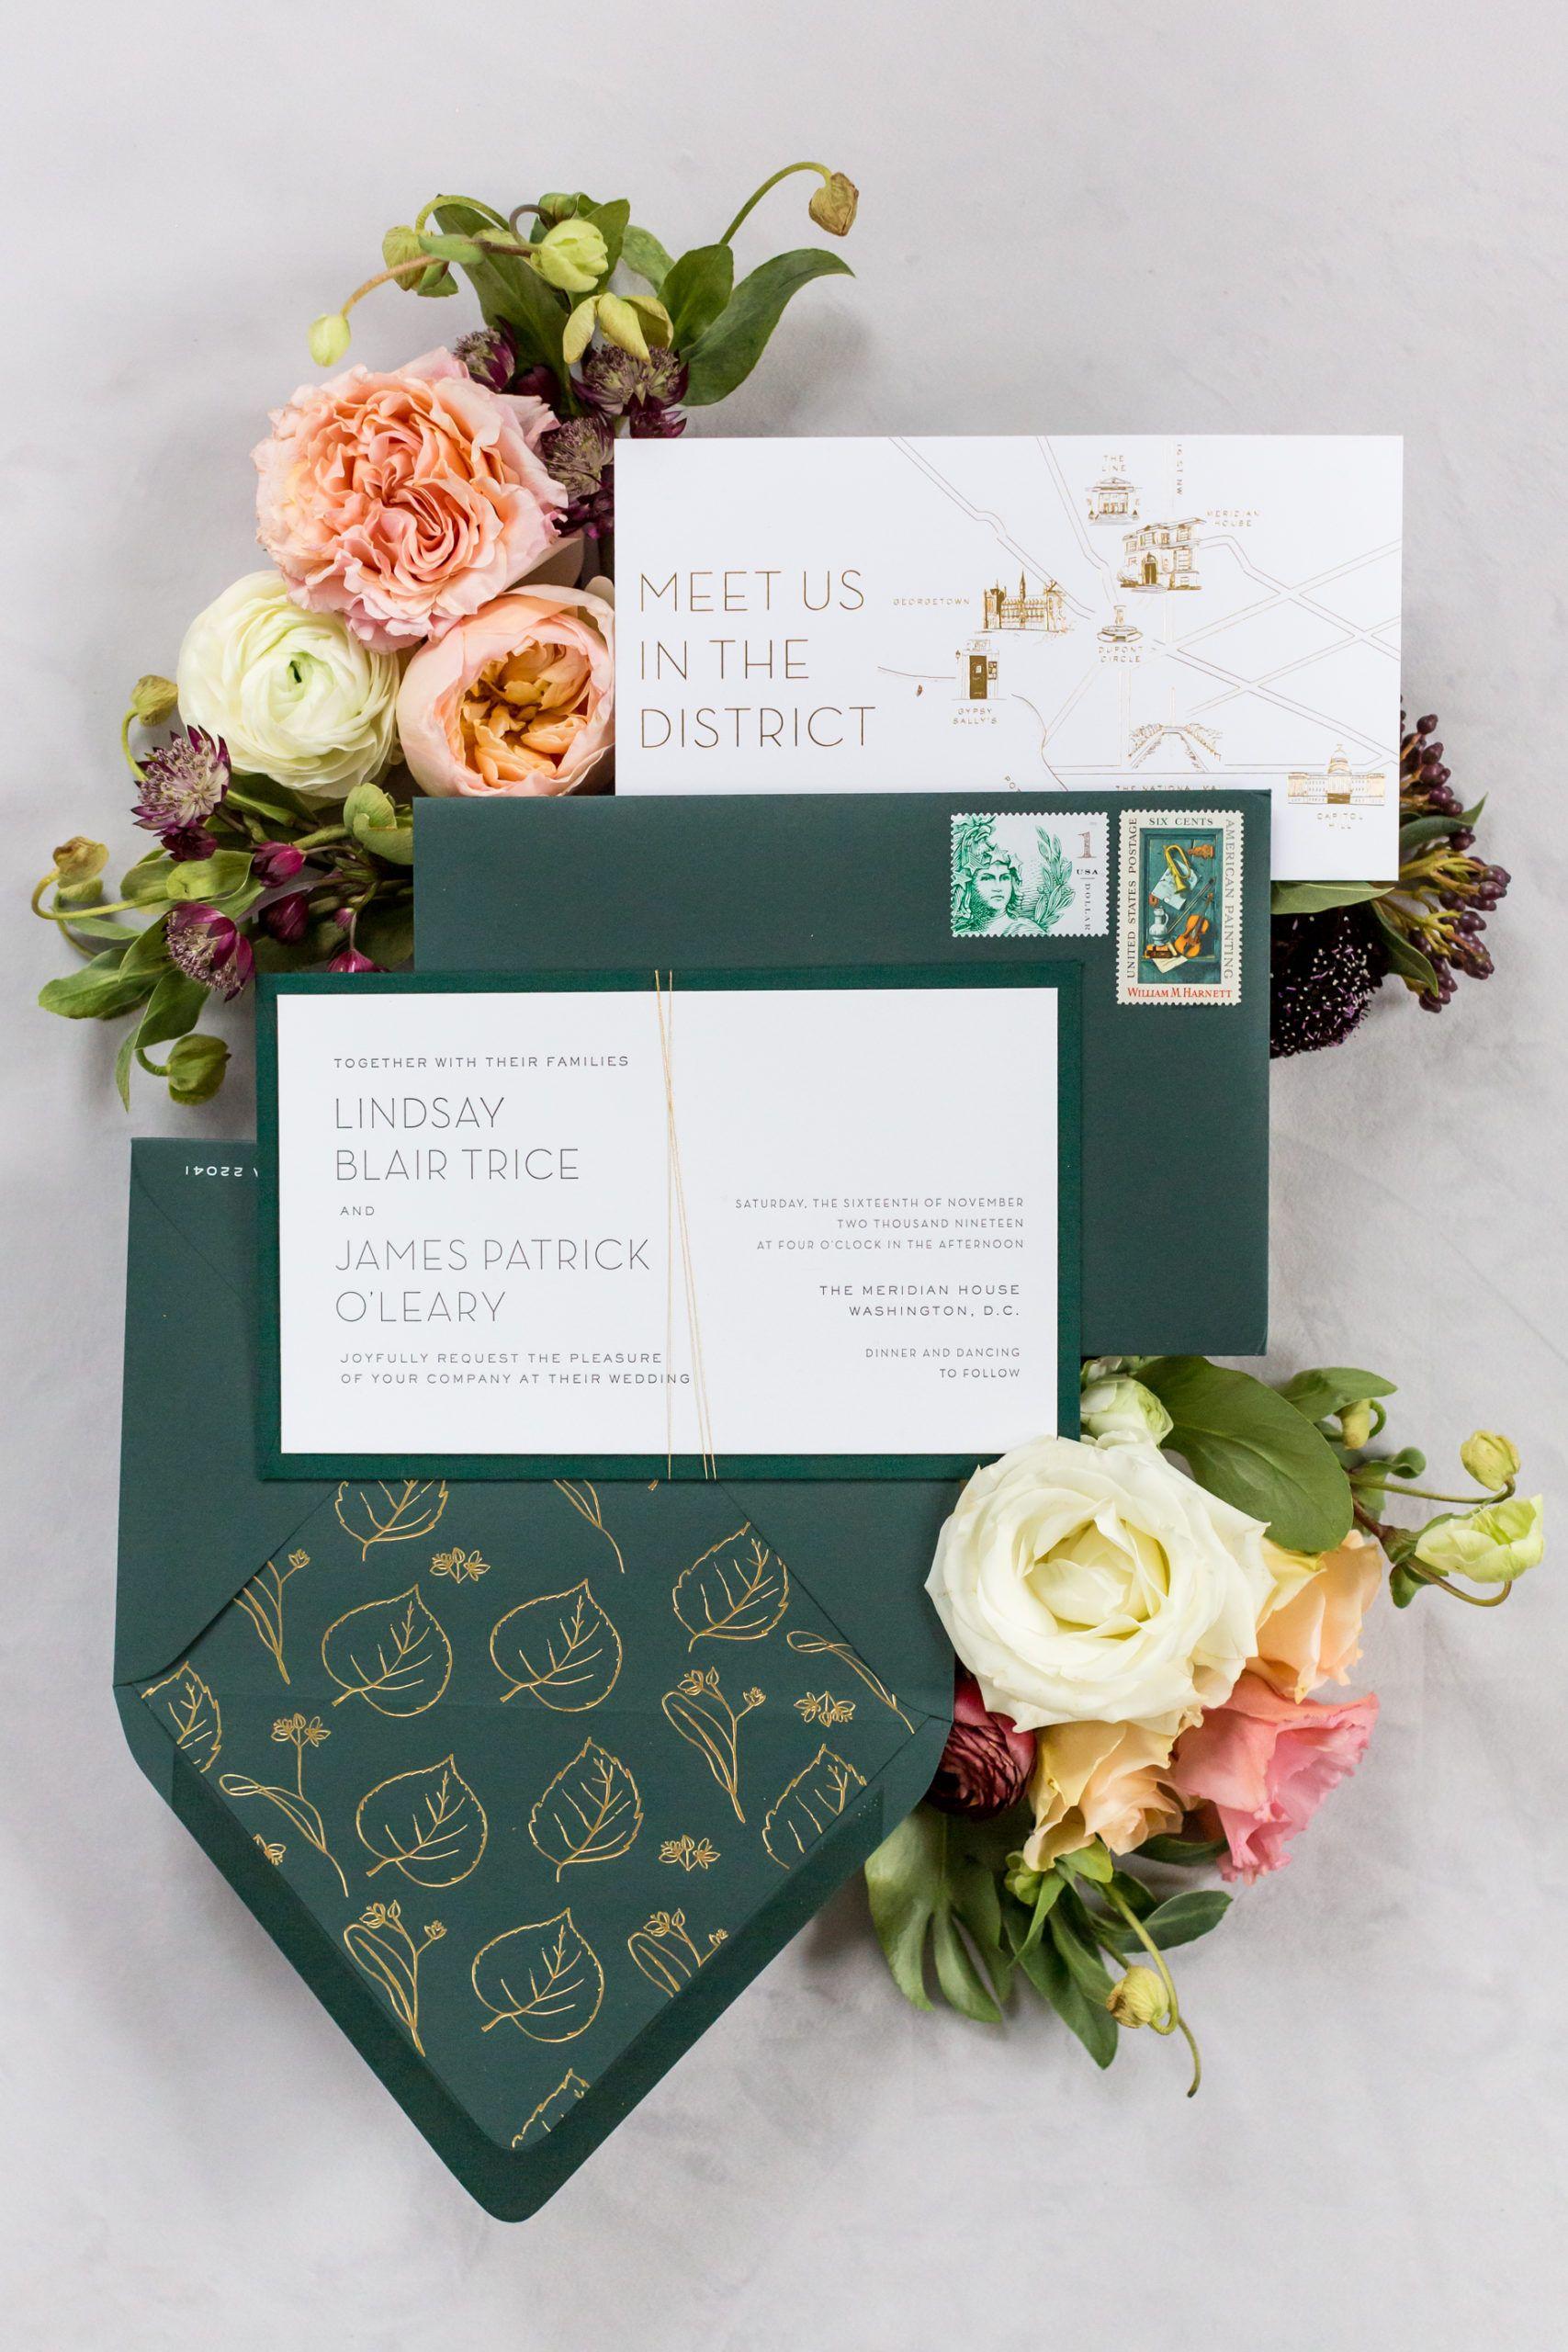 2019 Weddings Invitation Flat Lays Floral Invitation Design Wedding Stationery Wedding Saving